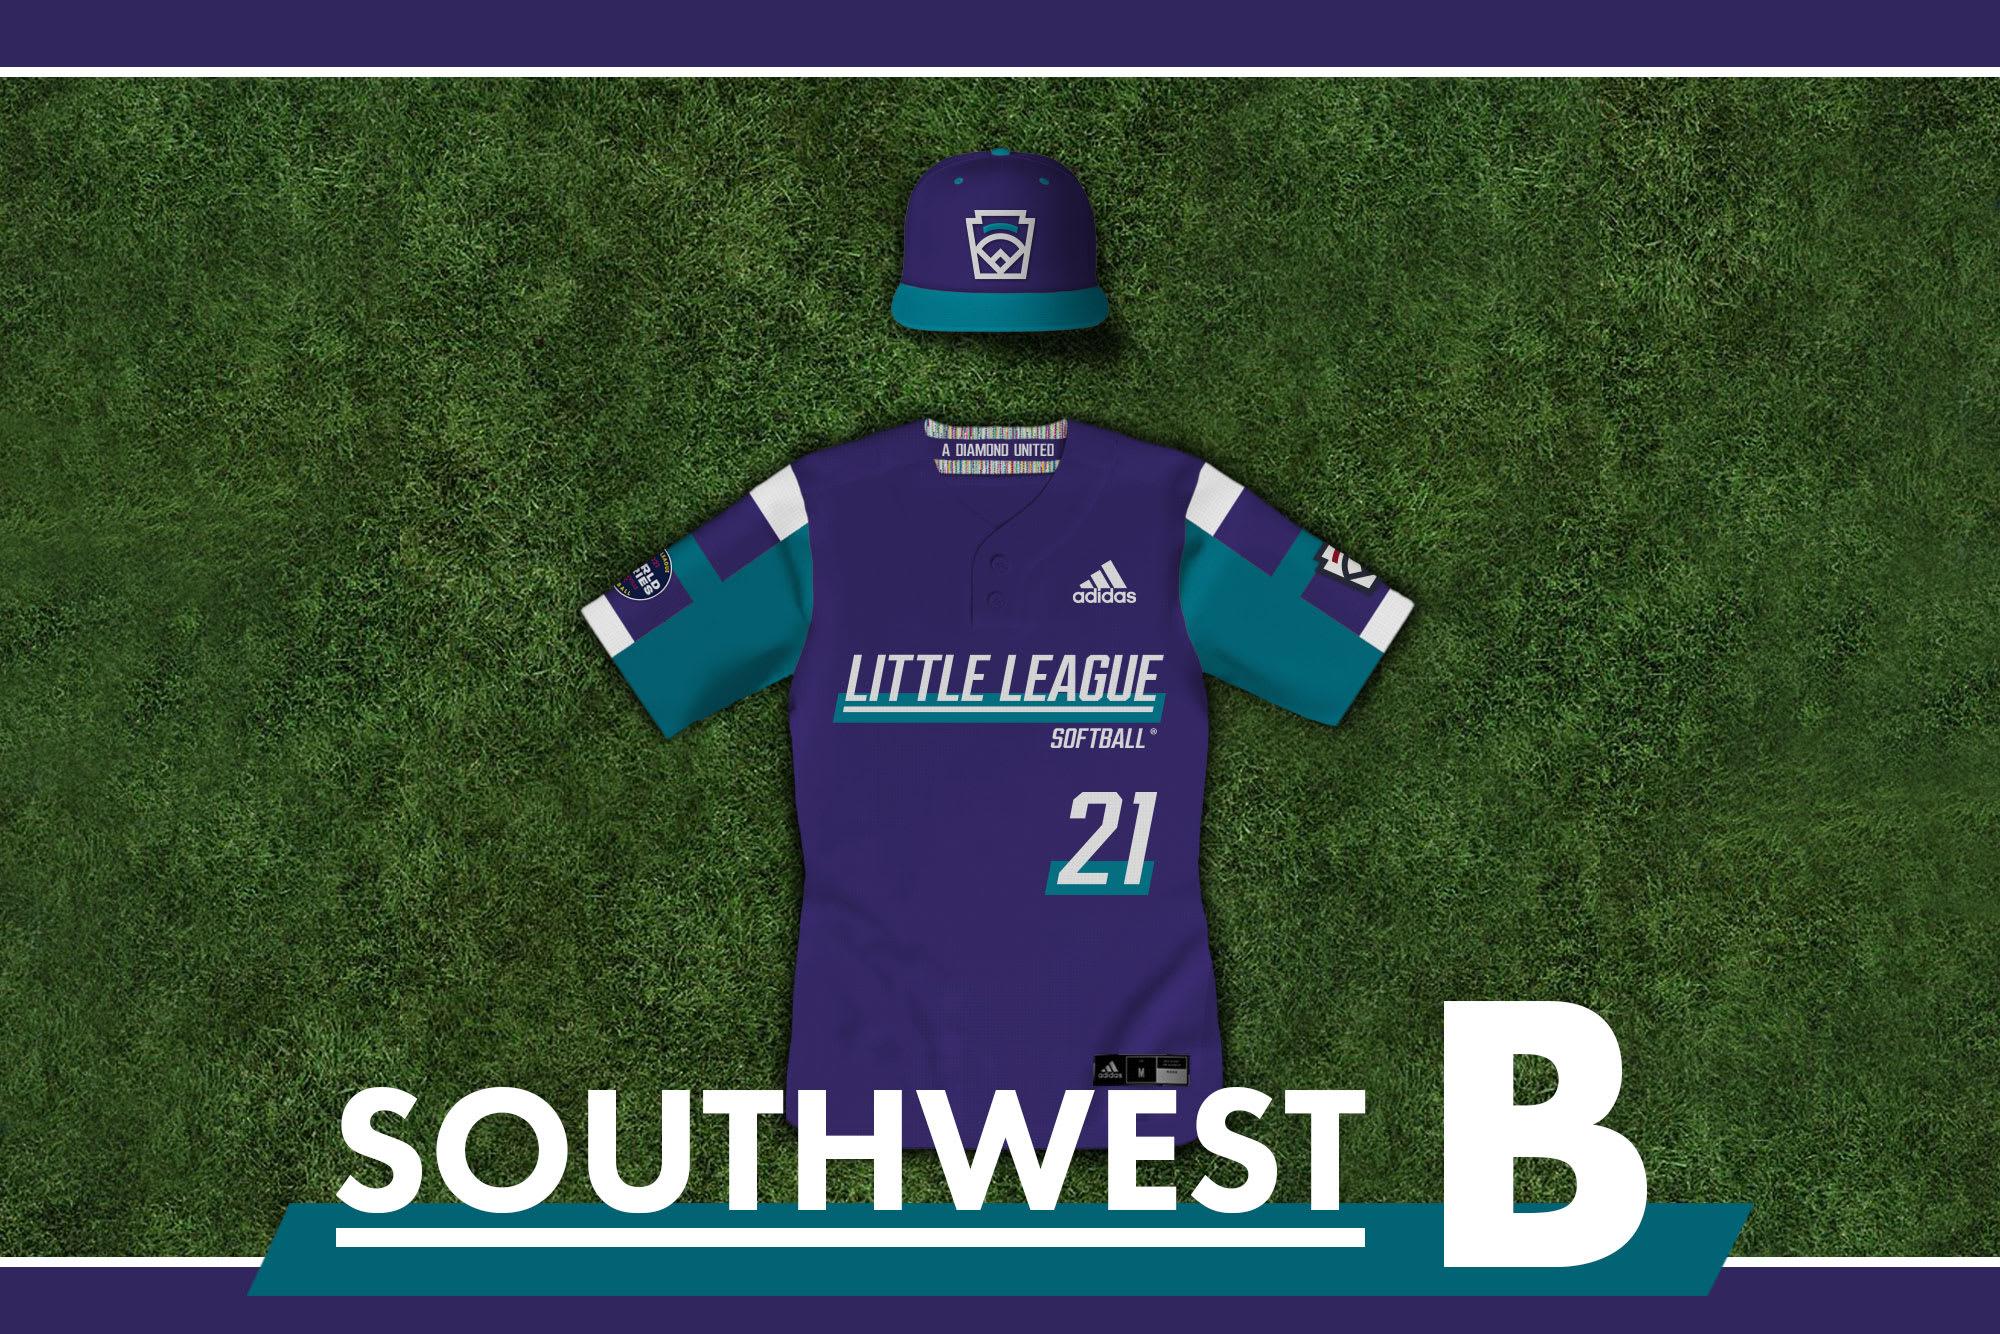 LLSB Southwest B uniform